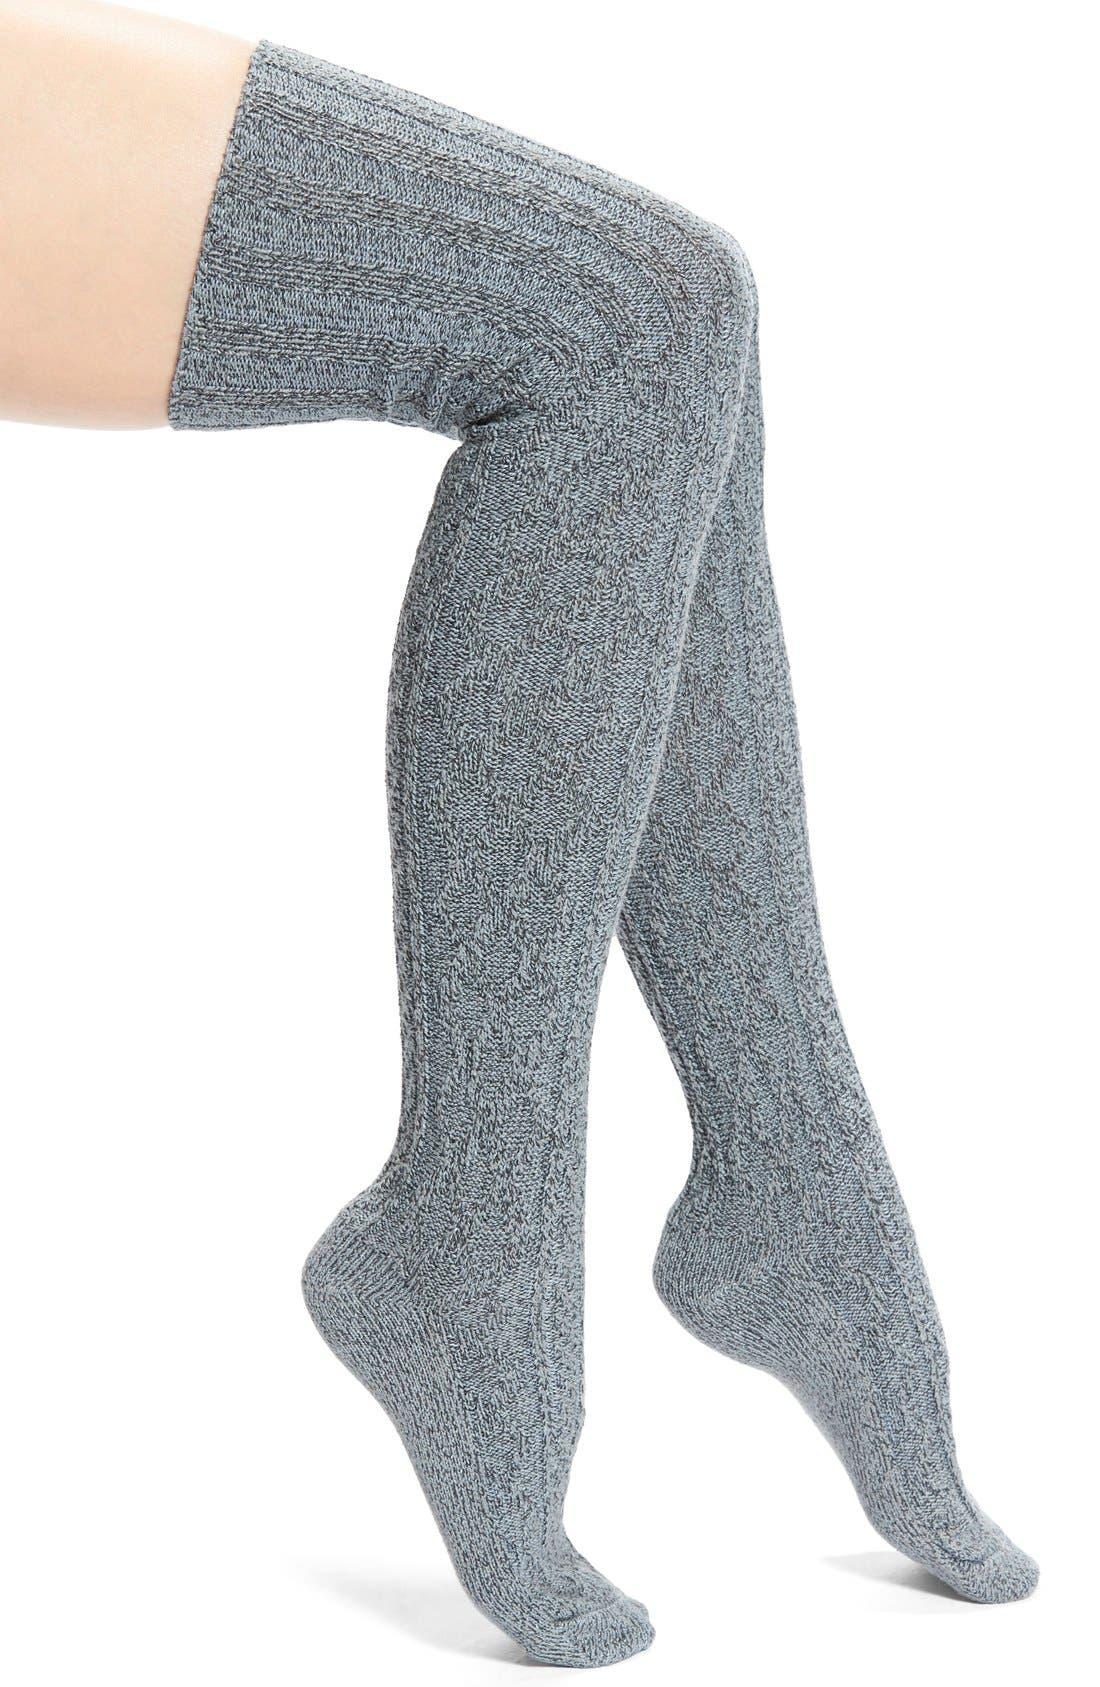 Peony & Moss MarledCable Knit Thigh High Socks